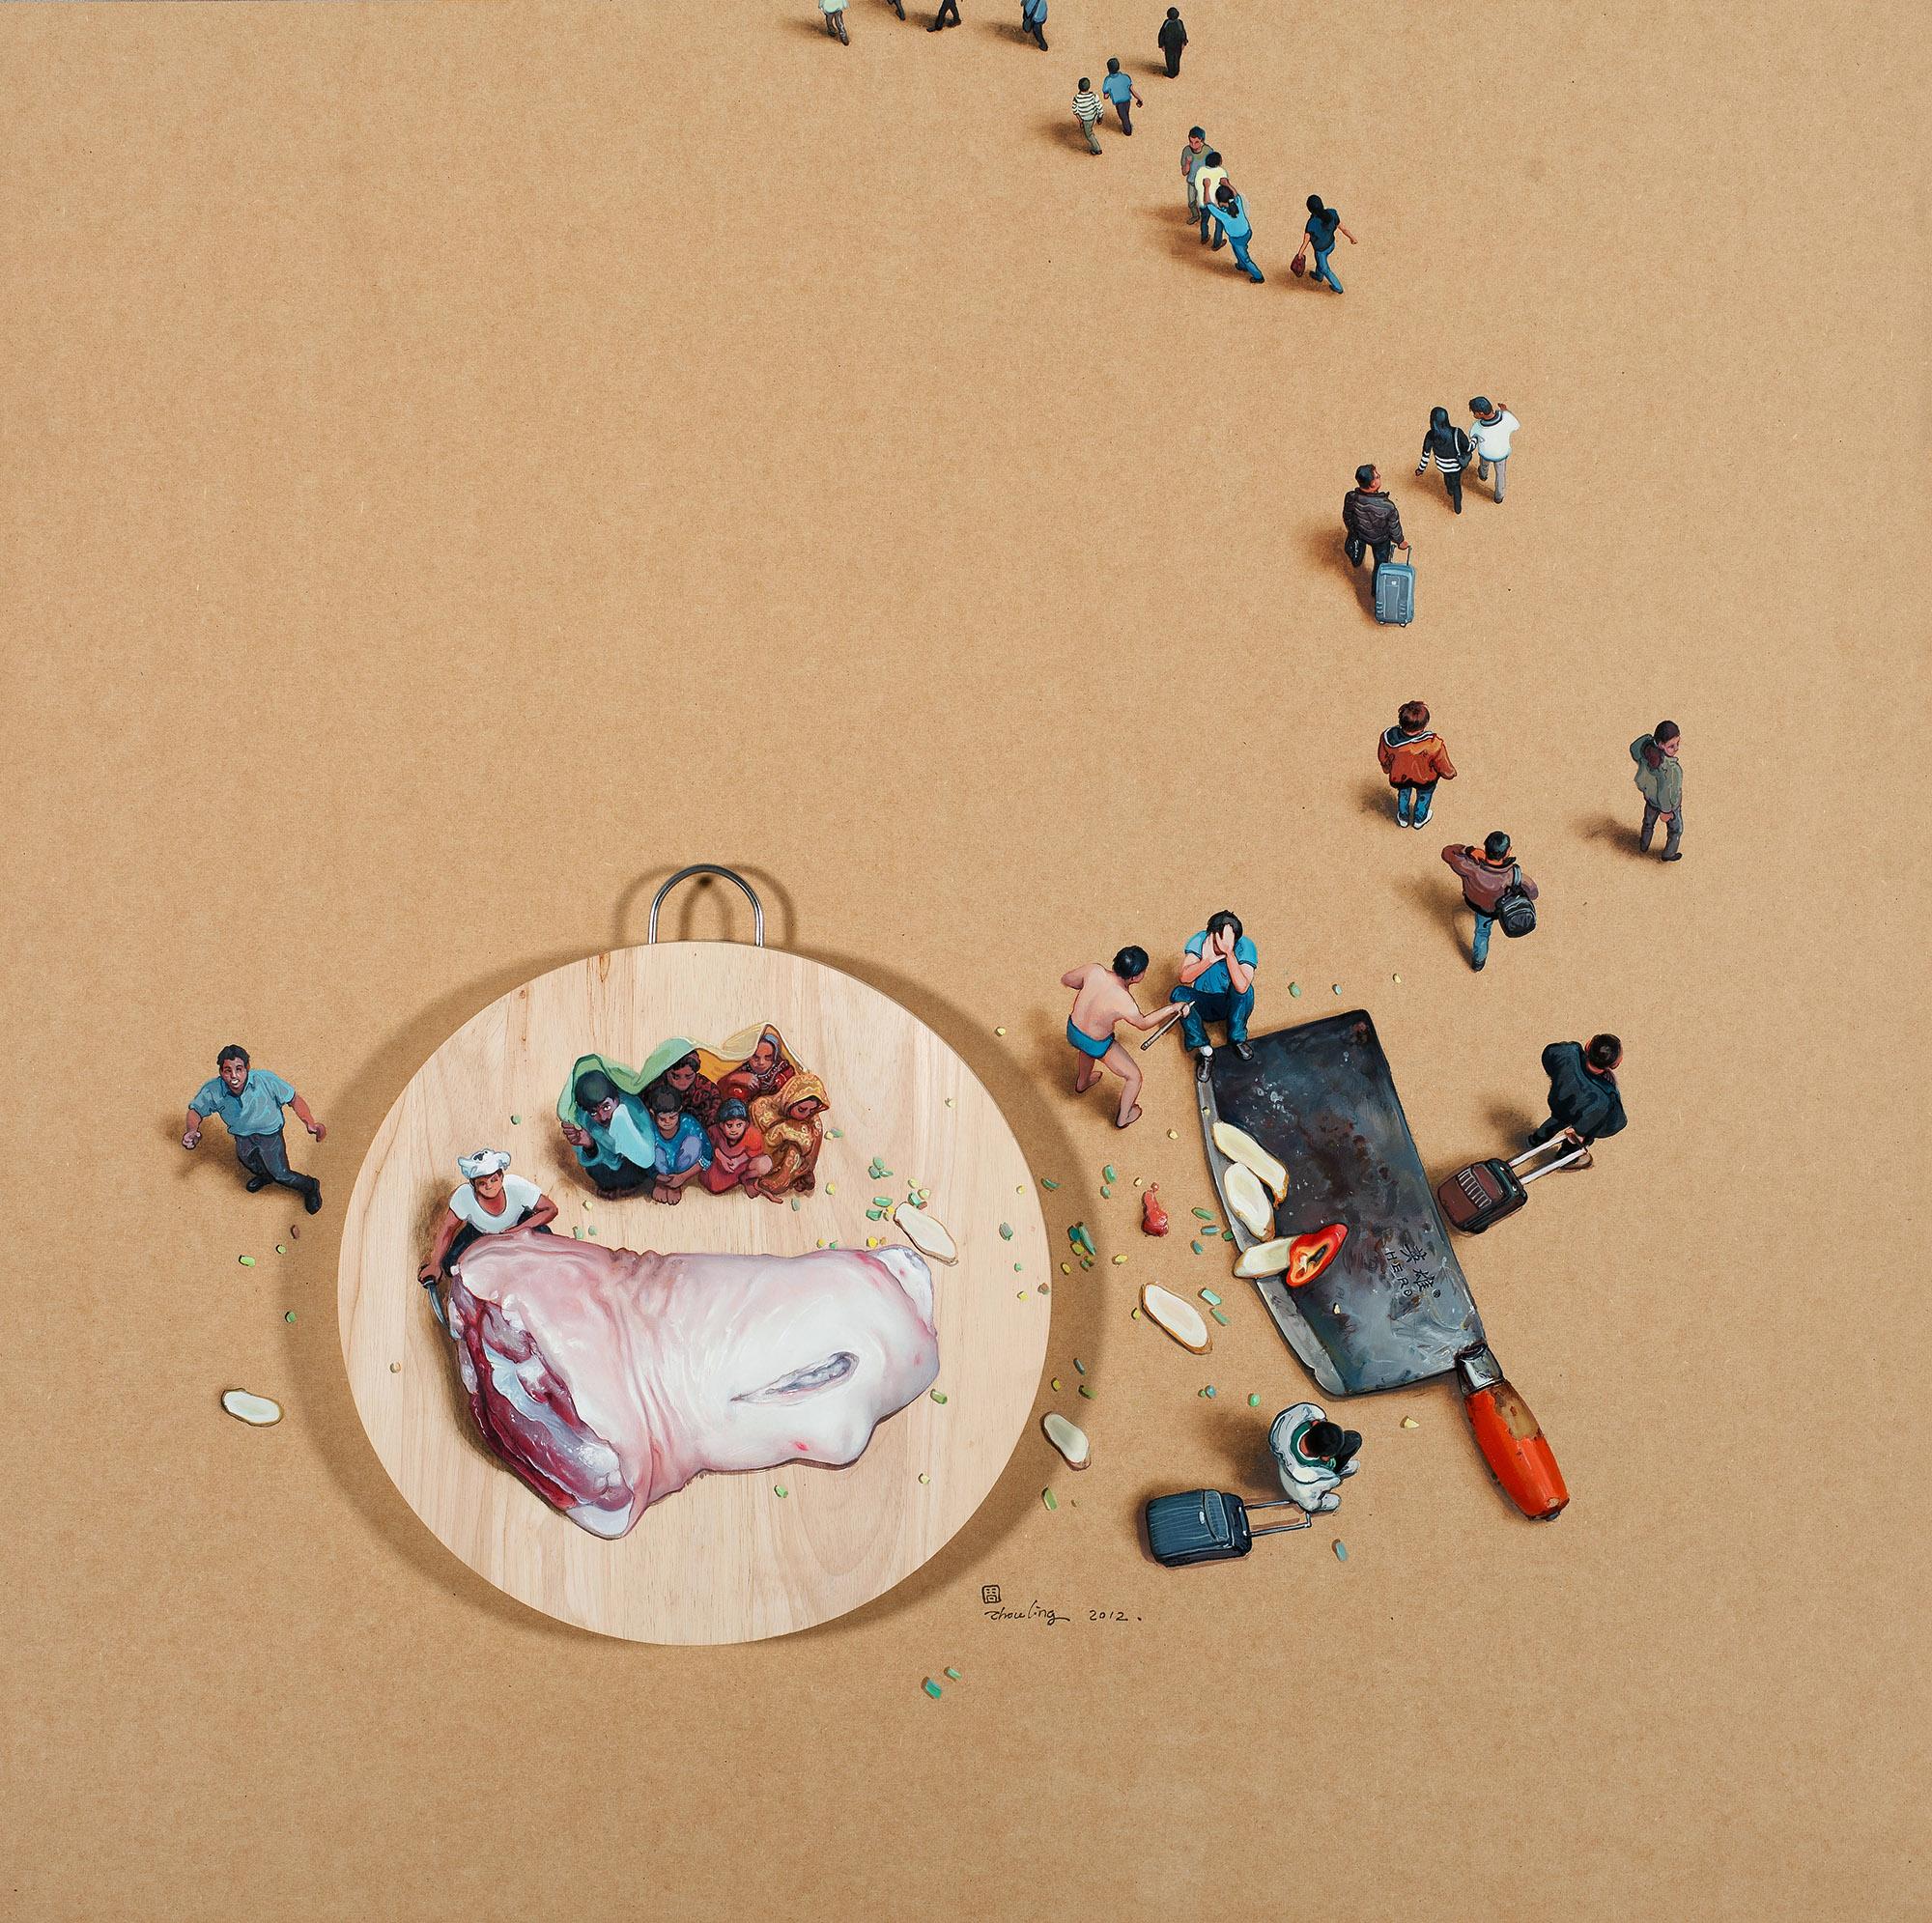 Zhou Jinhua 周金华, Sphere of Life 生活场, 2012, Oil on board 木板油画, 100 x 100 cm